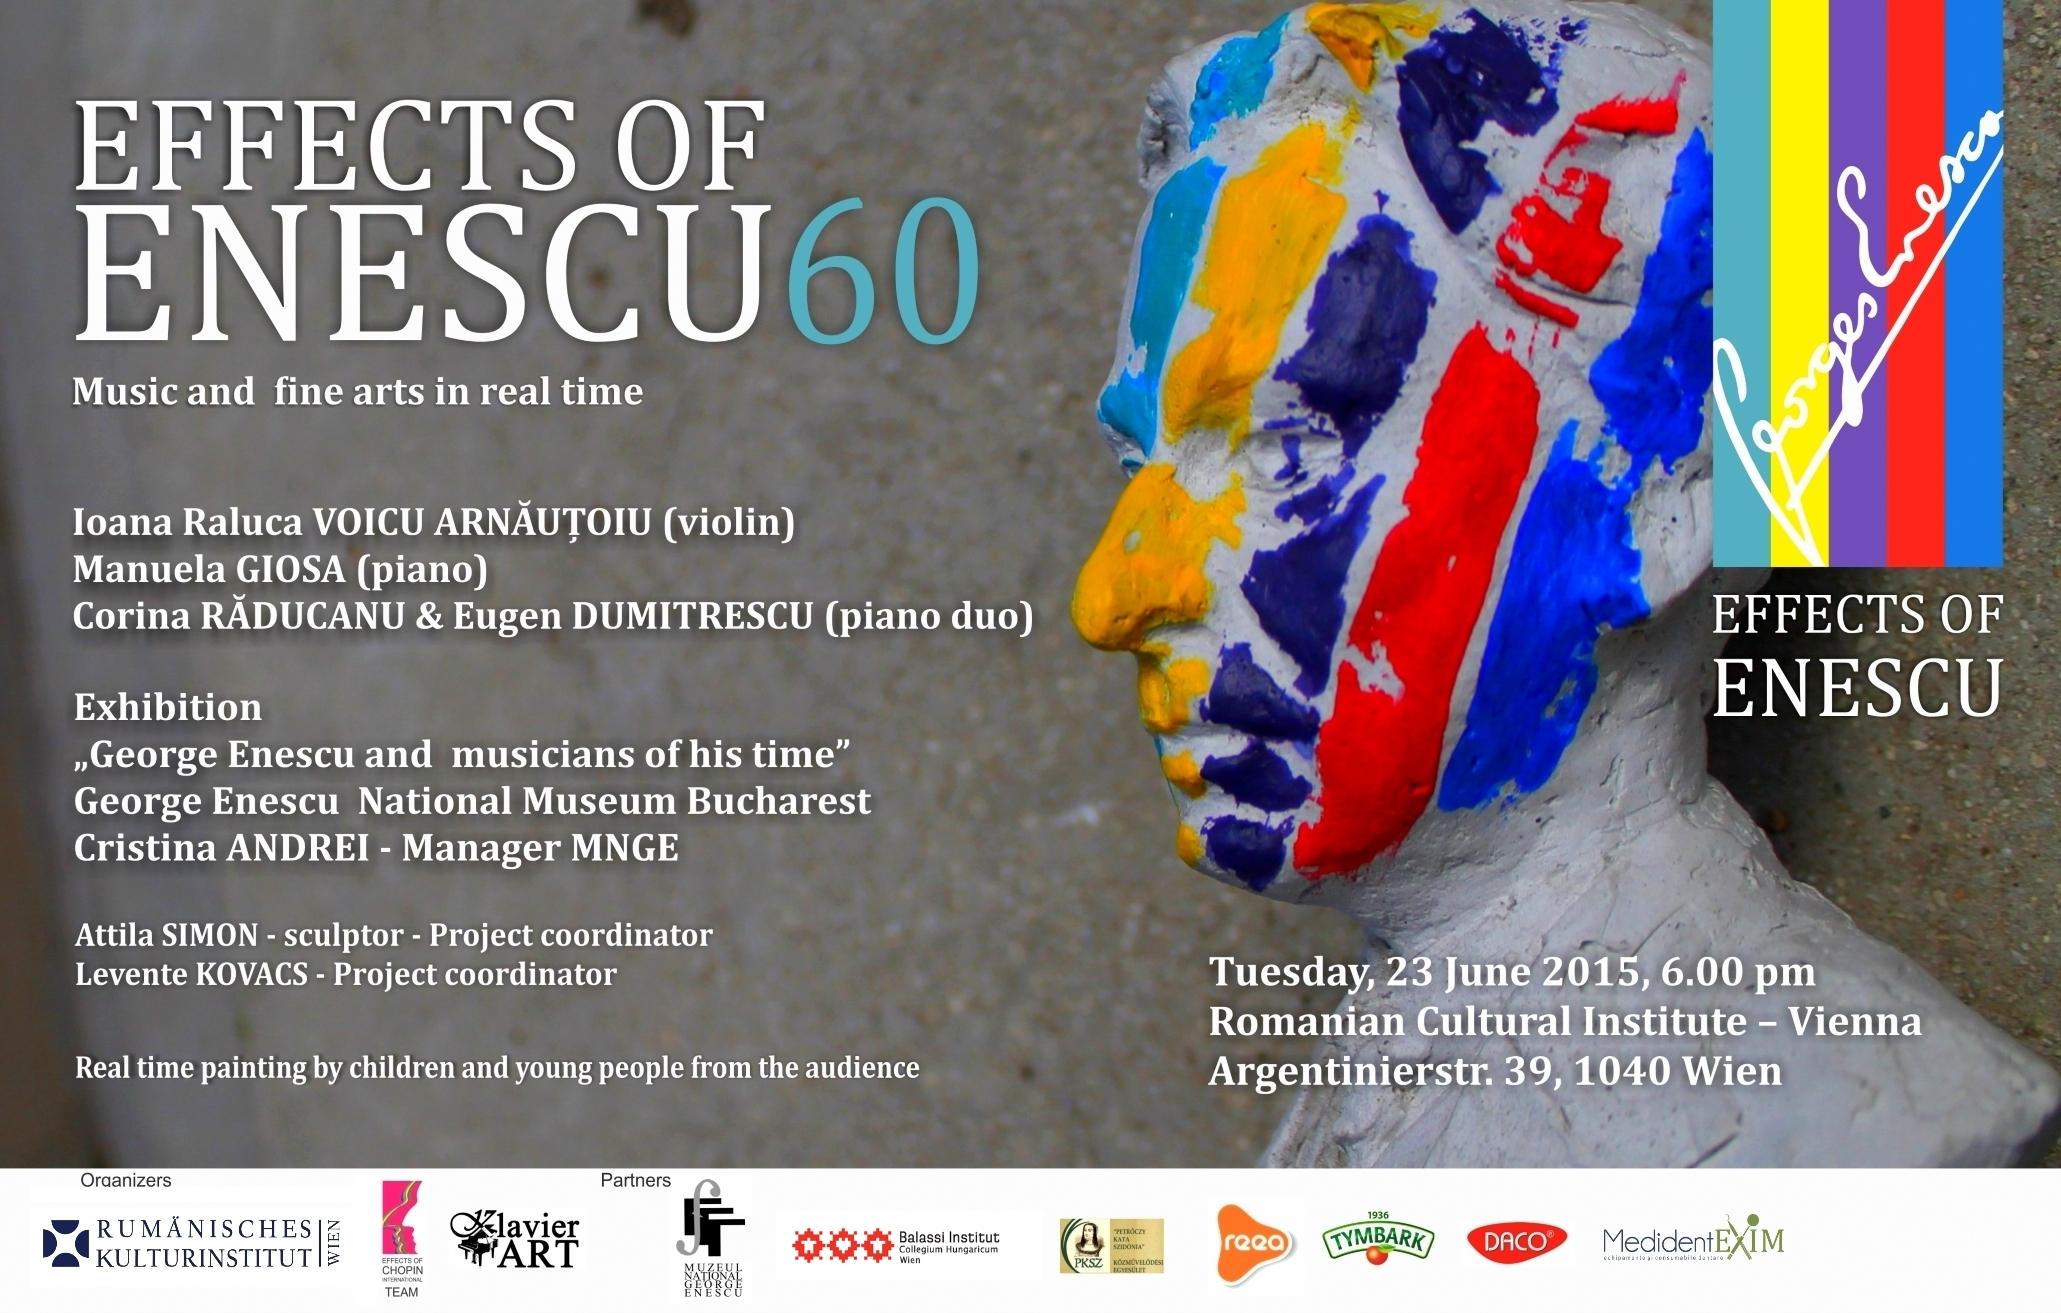 Effects of Enescu